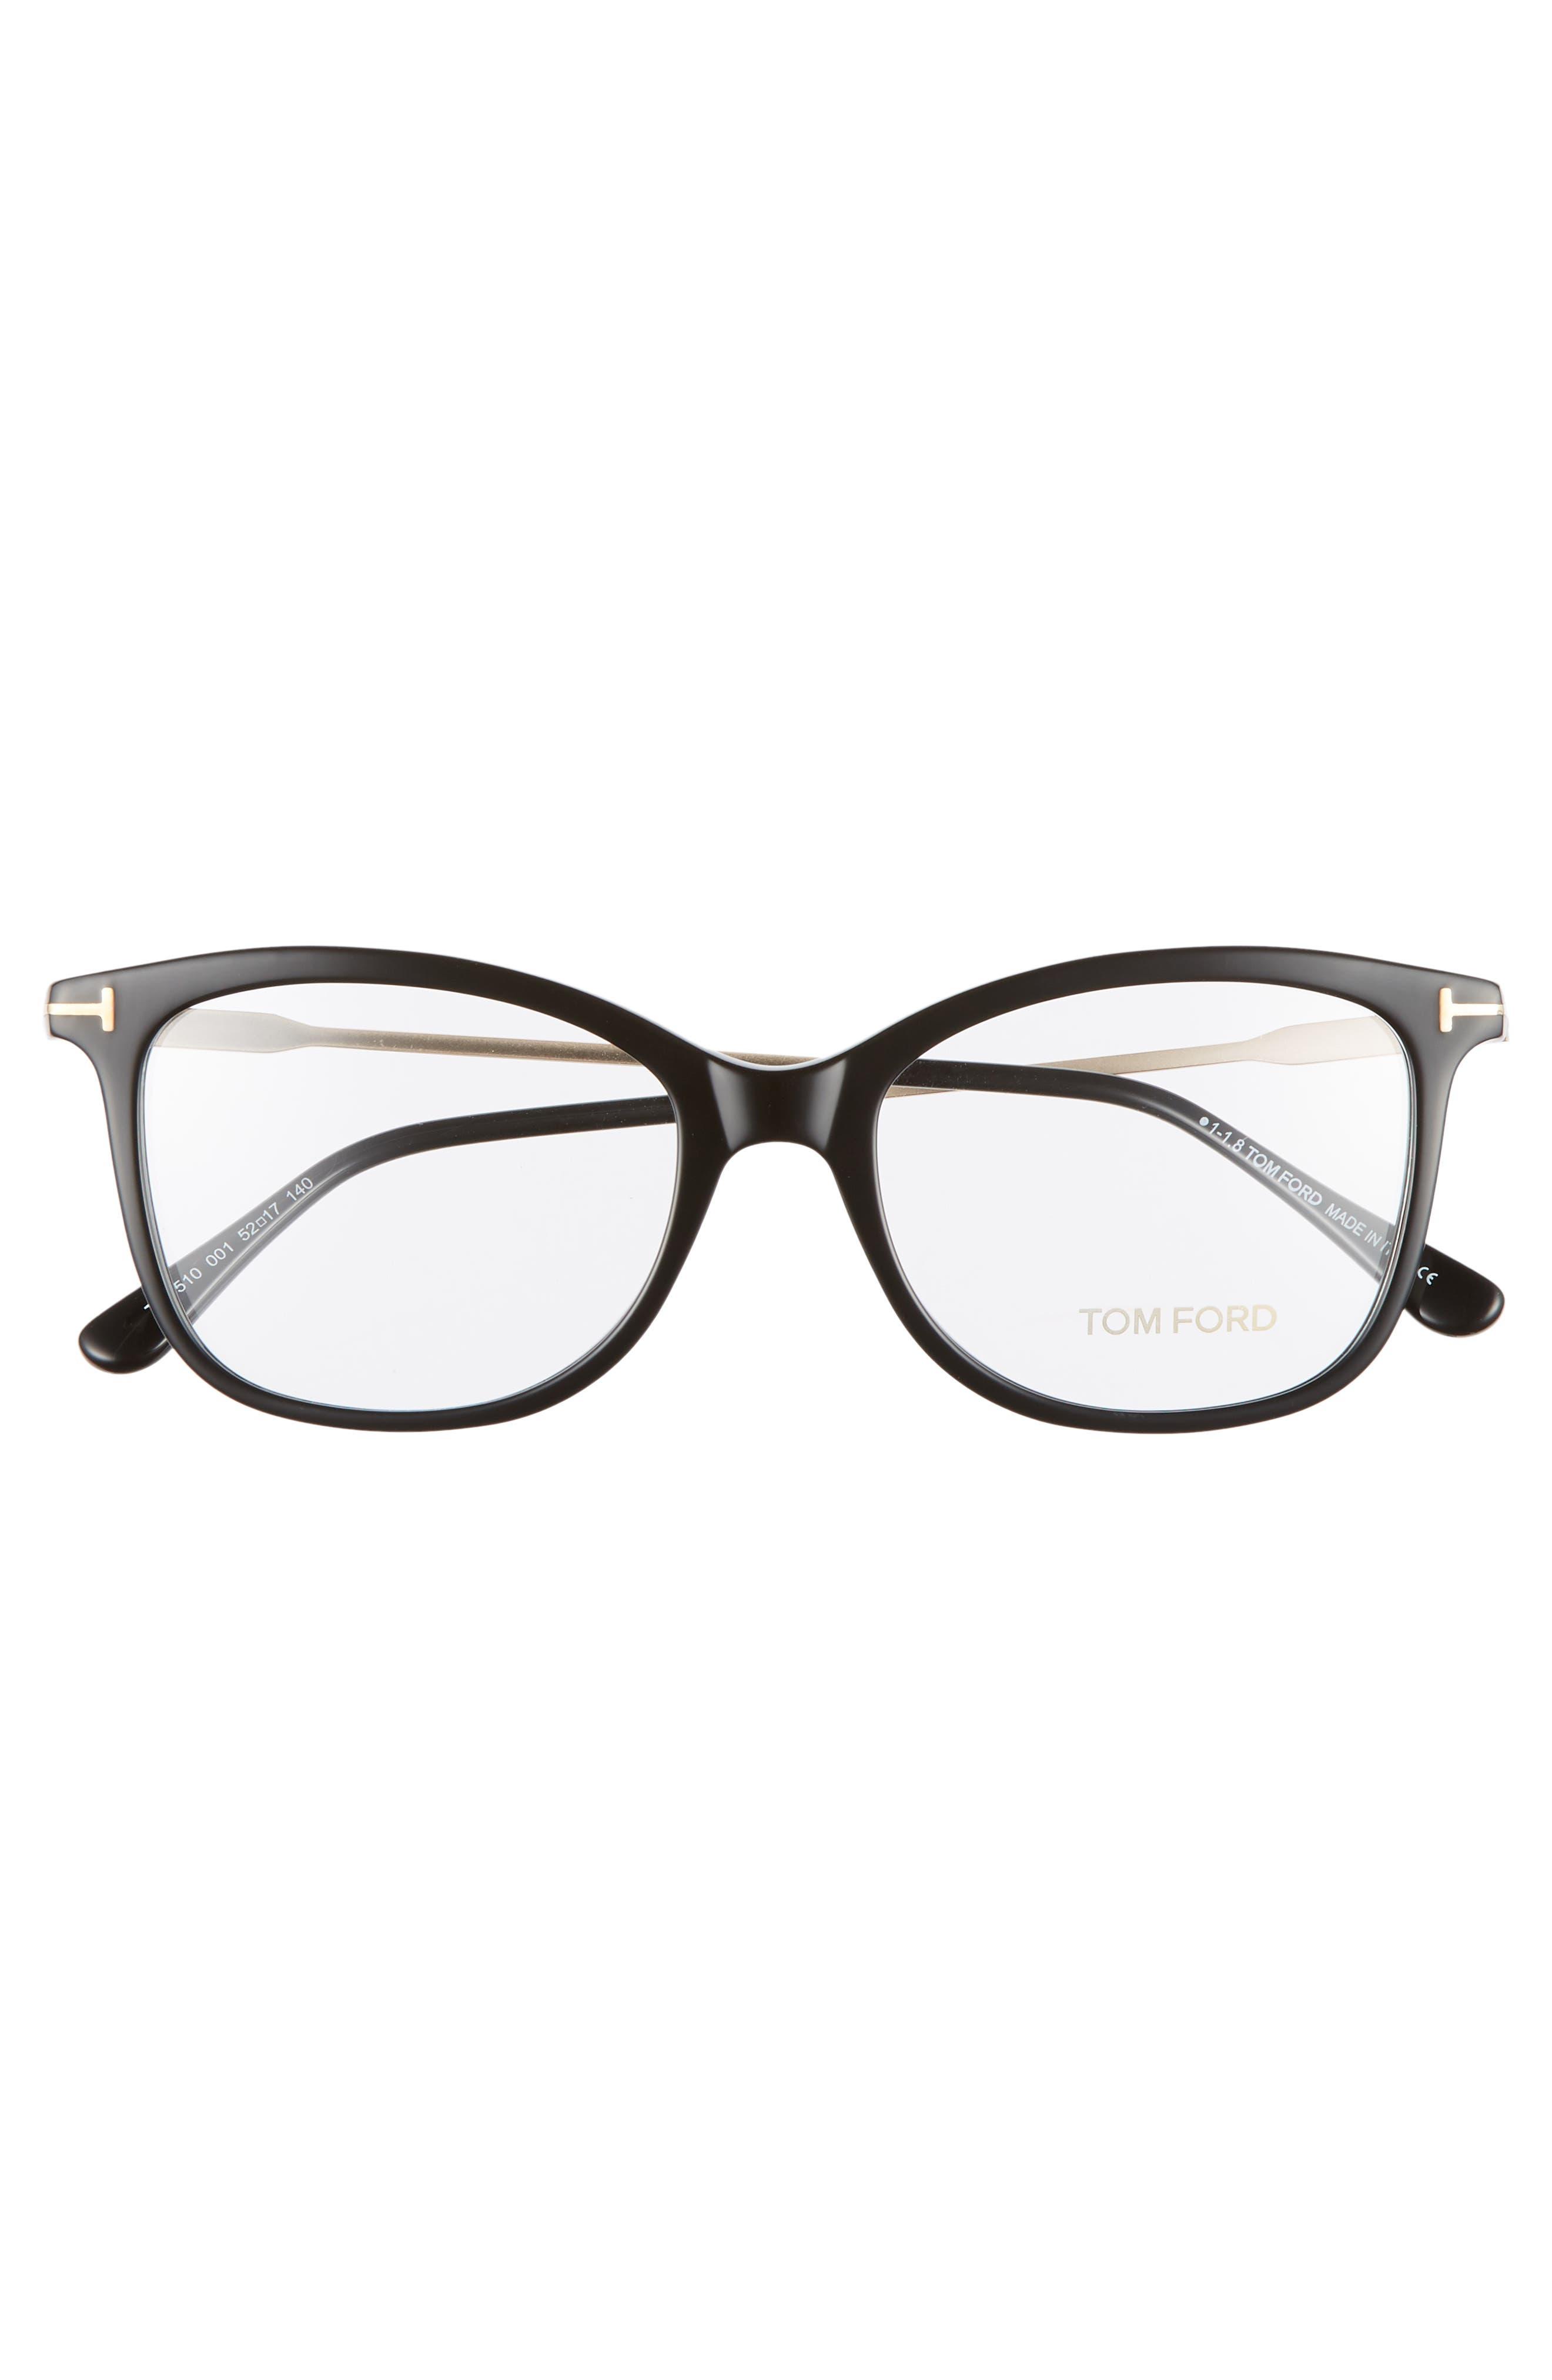 52mm Round Optical Glasses,                             Alternate thumbnail 3, color,                             SHINY BLACK ACETATE